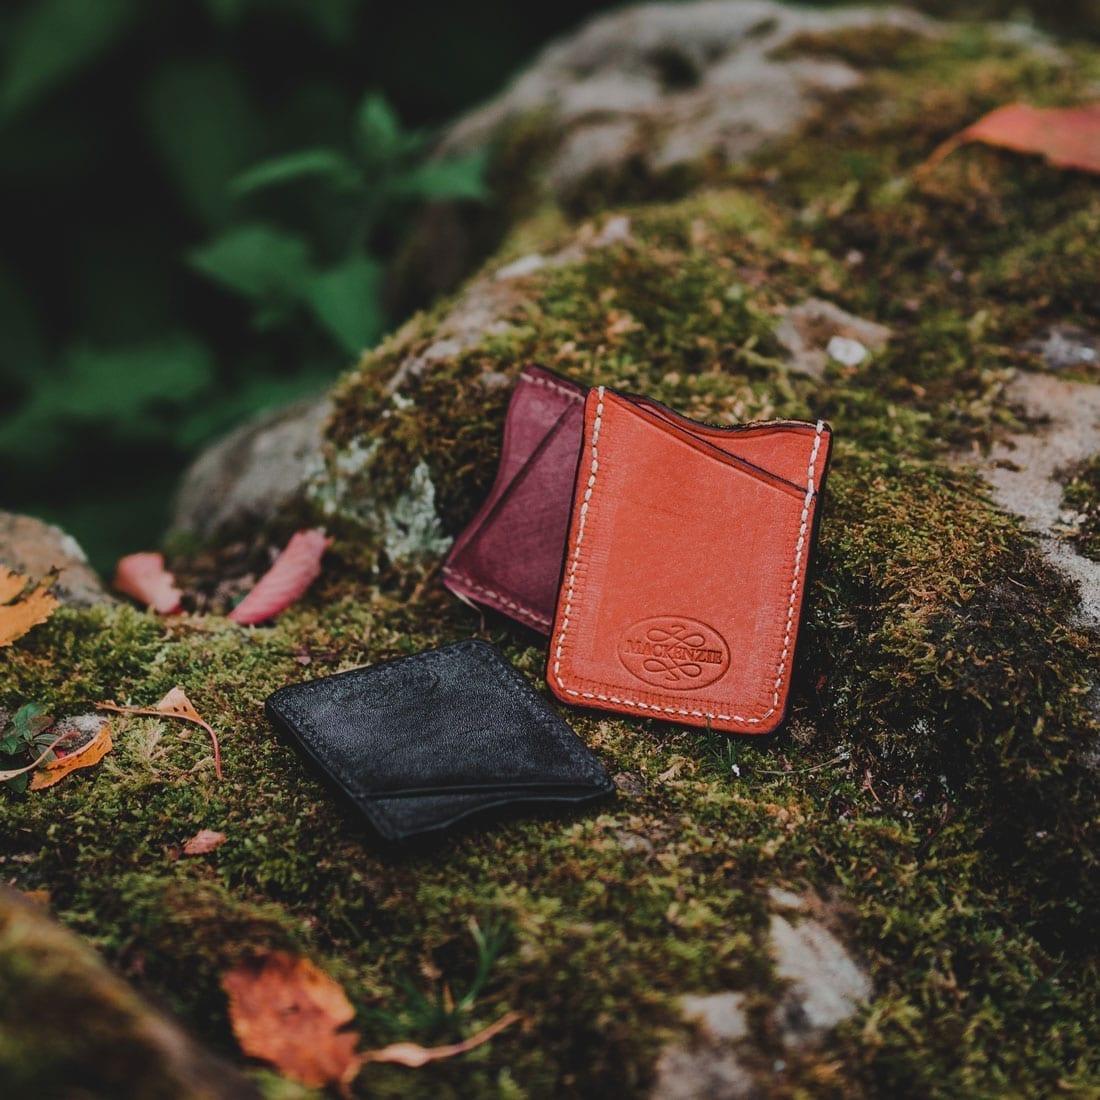 The Oak Cardholder colours